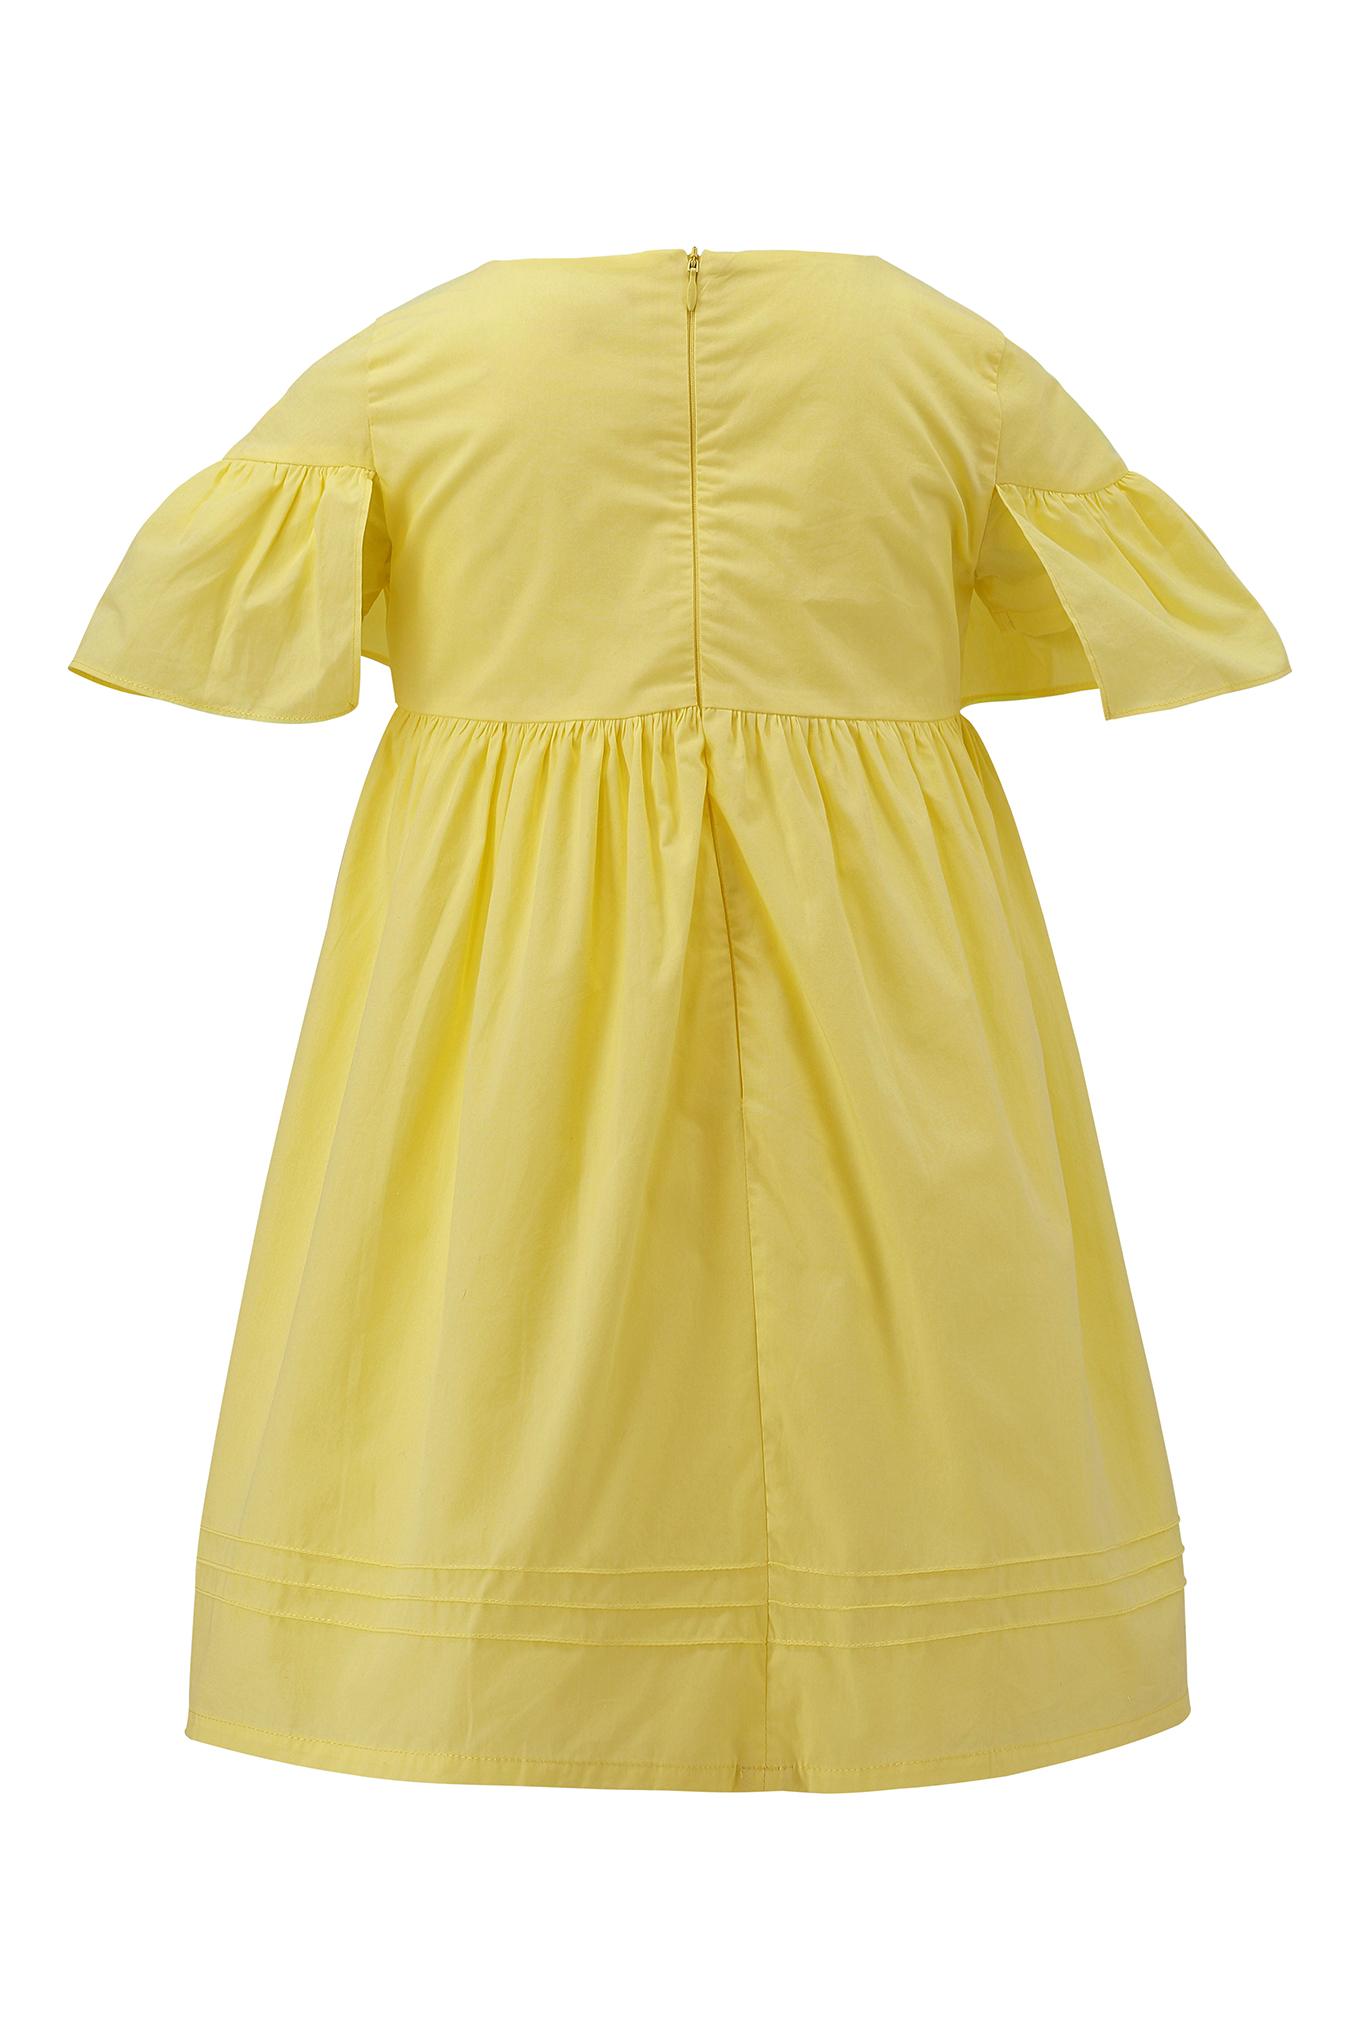 Dress Lemonade Casual Girl